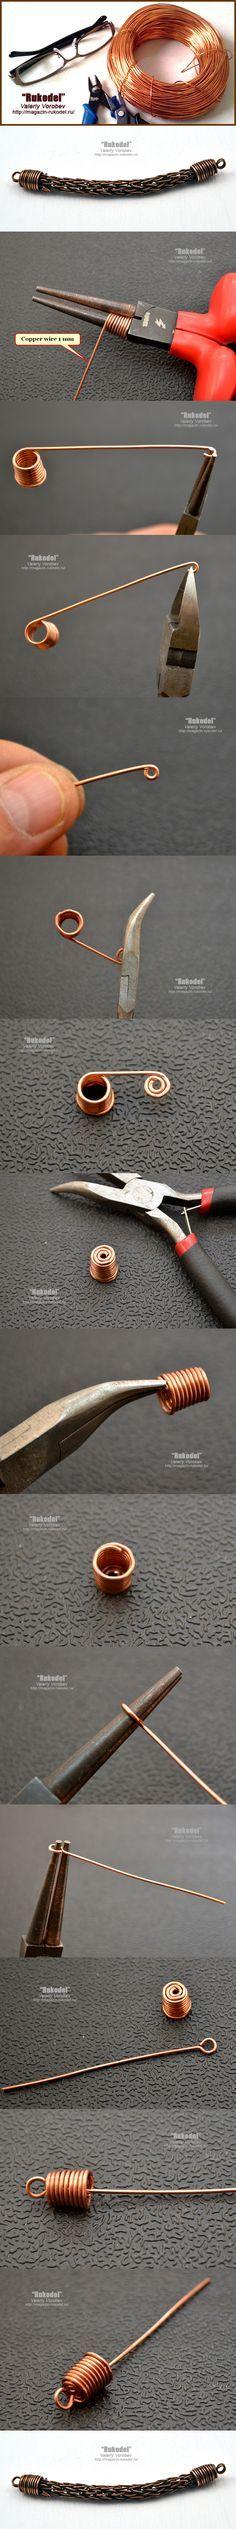 Caps of copper wire Концевики для бижутерии своими руками.   Рукодел